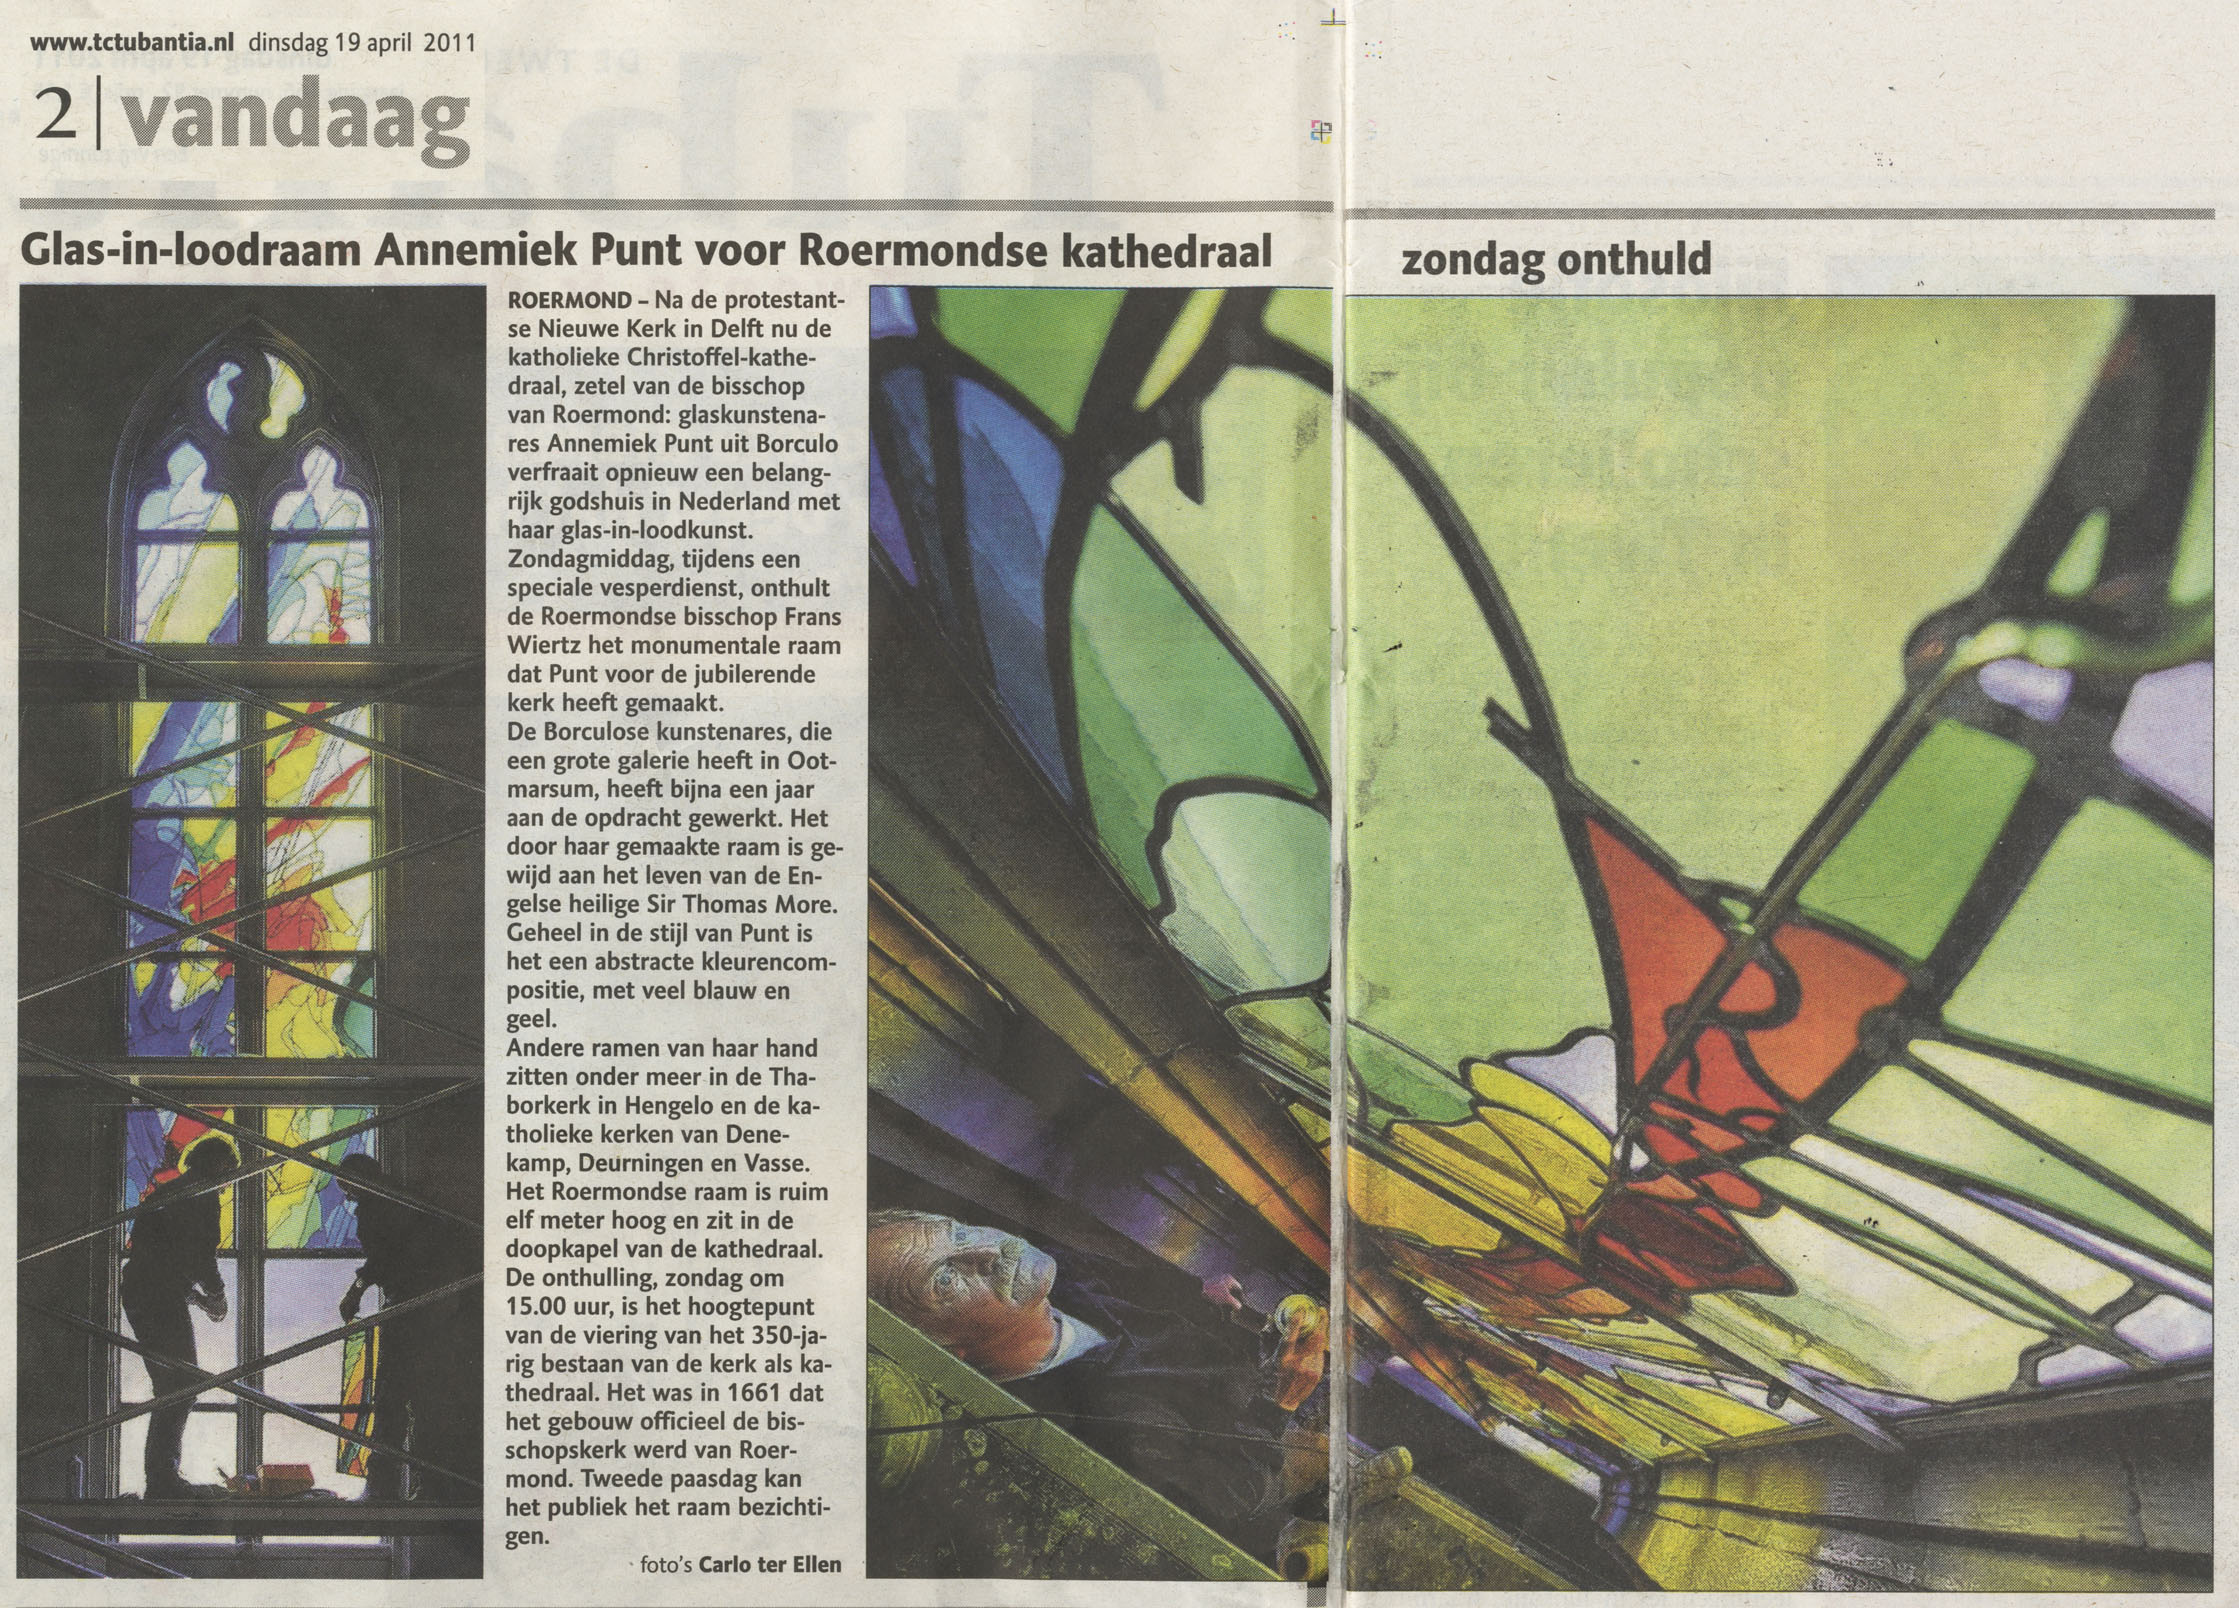 'Glas-in-loodraam Annemiek Punt voor Roermondse kathedraal zondag onthuld' | Atelier Galerie Annemiek Punt Ootmarsum Glas & Schilder Kunst